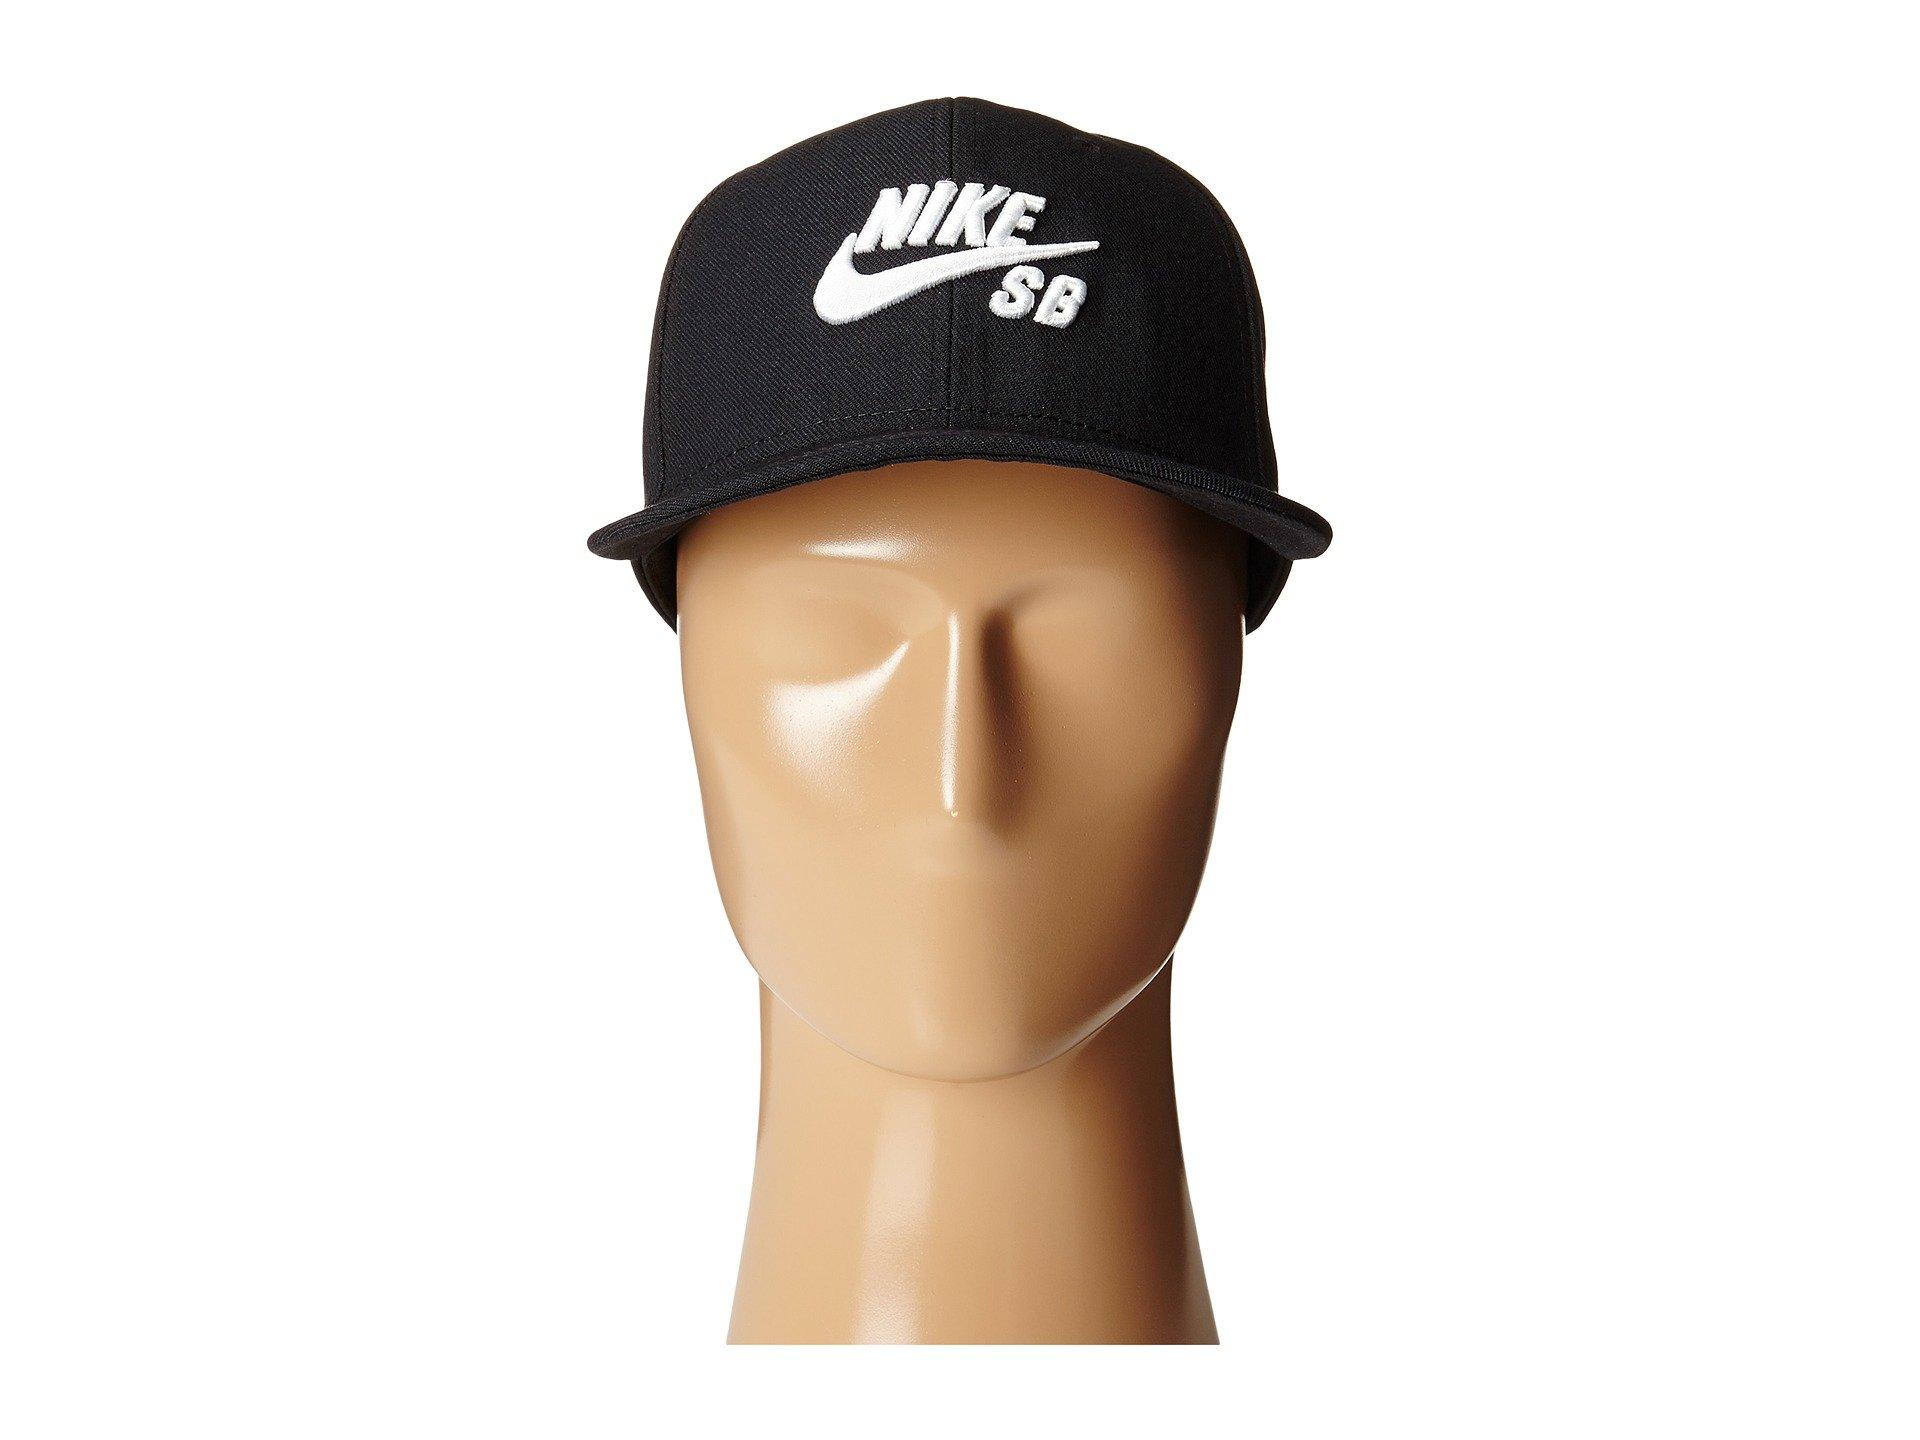 nike sb icon hat